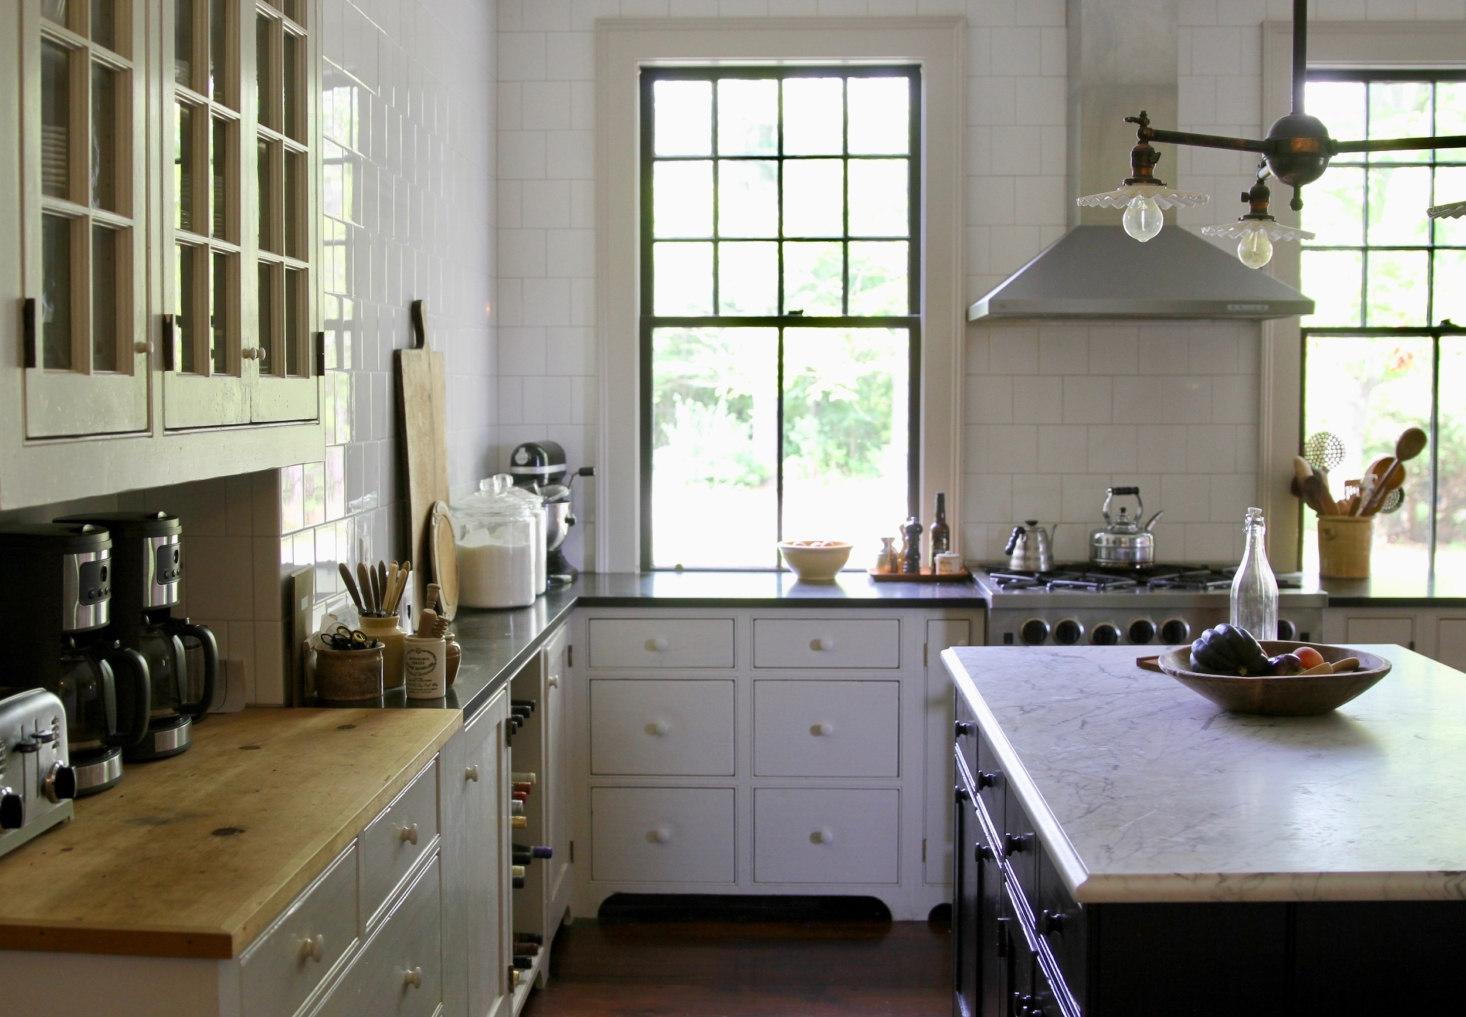 inn-kenmore-hall-kitchen-1466x1017.jpg